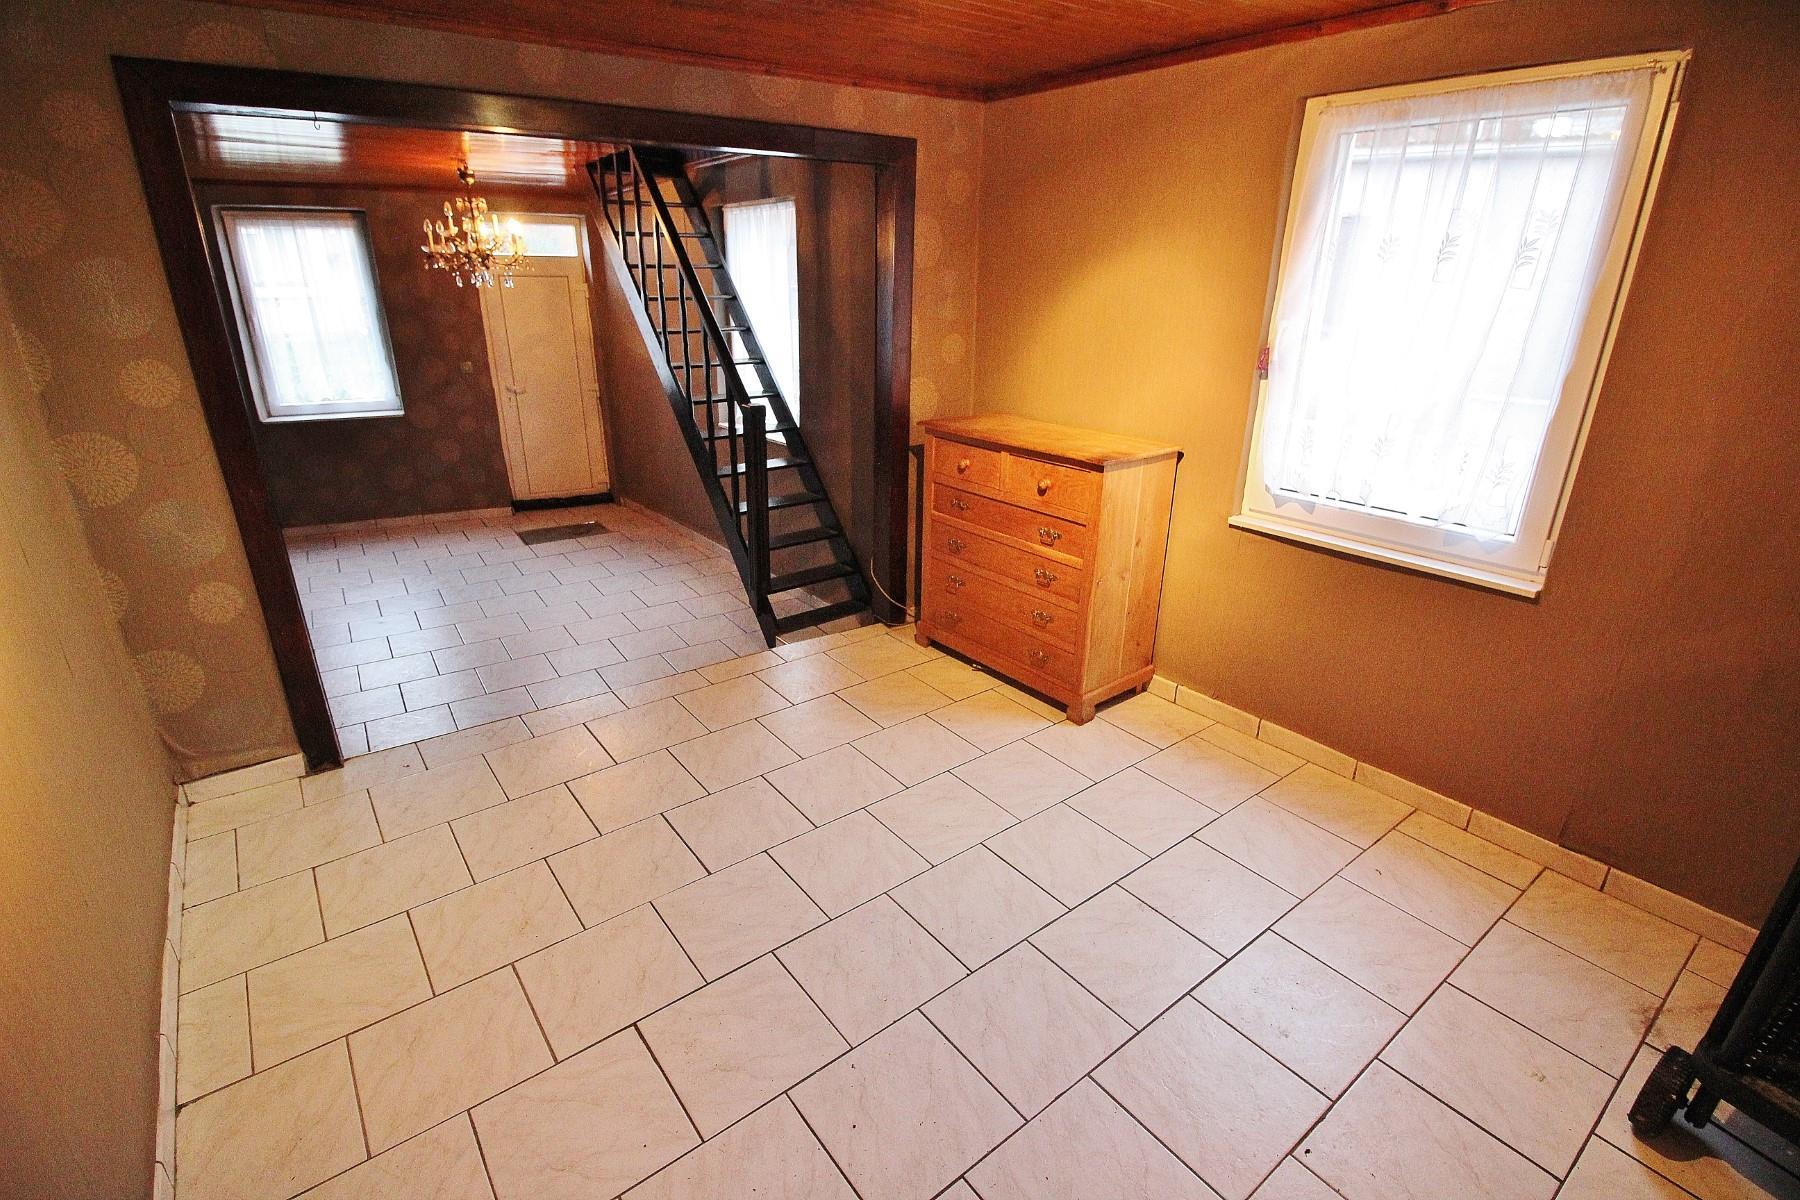 Maison - Beyne-Heusay Bellaire - #3946189-2